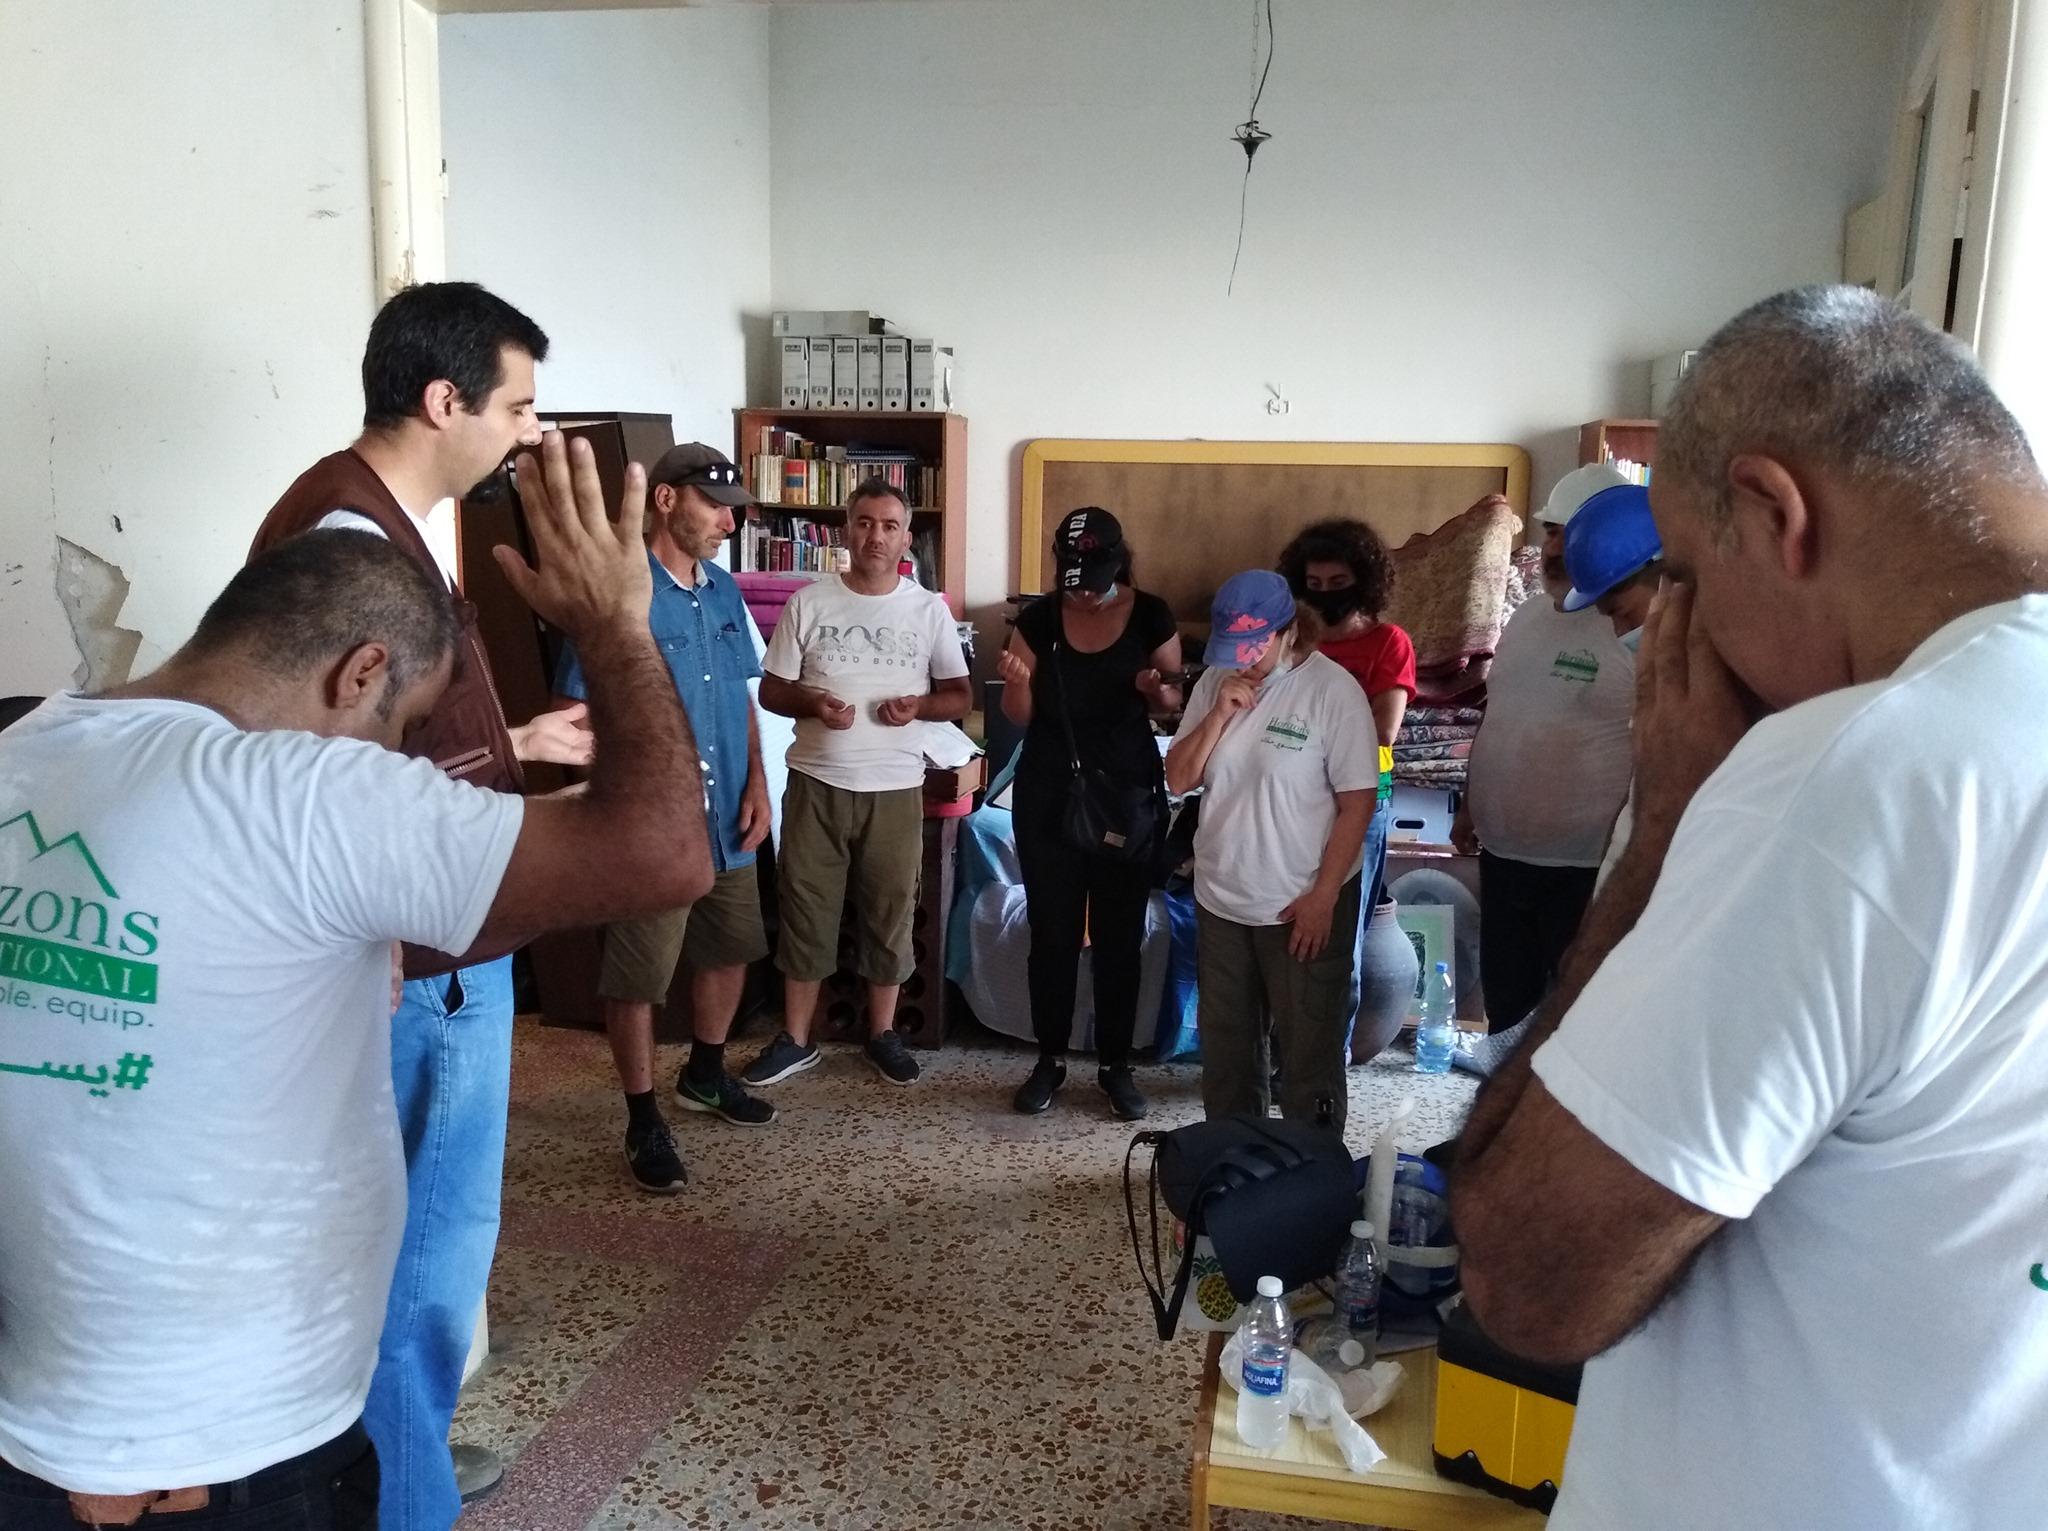 Horizons International Continues to Aid Lebanon's Churches in Bringing Hope amid Crisis